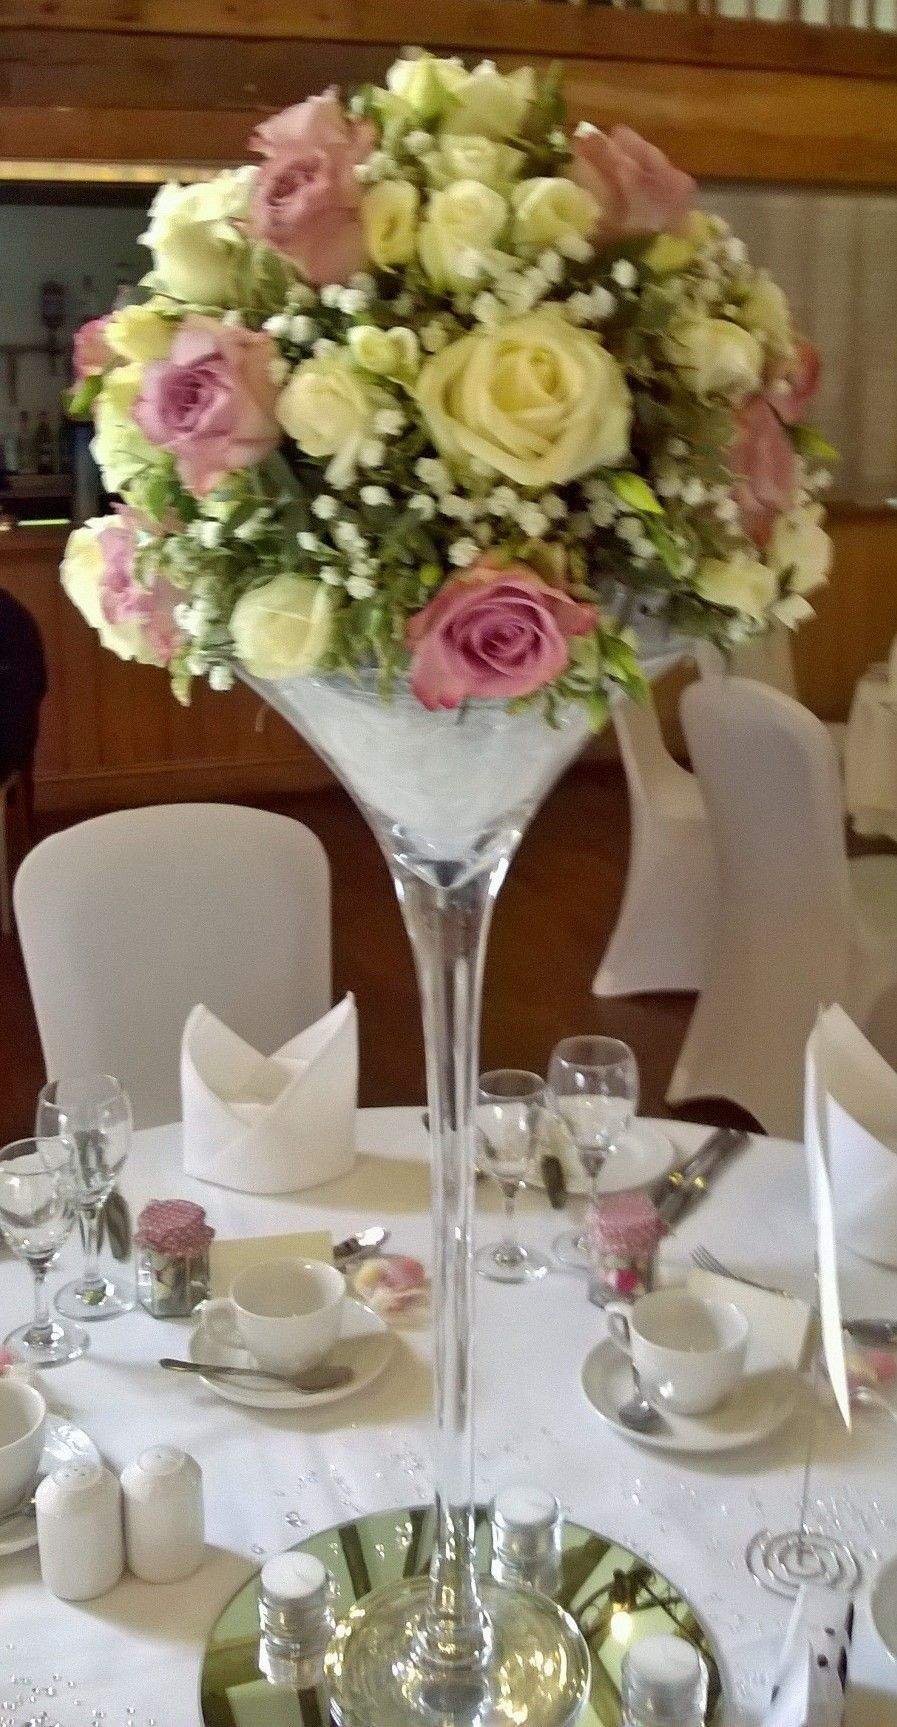 Memory lane roses and lisianthus martini vase wedding centrepiece memory lane roses and lisianthus martini vase wedding centrepiece wedding centrepiecescenterpiecesmartiniwedding flowersvaseshappy reviewsmspy